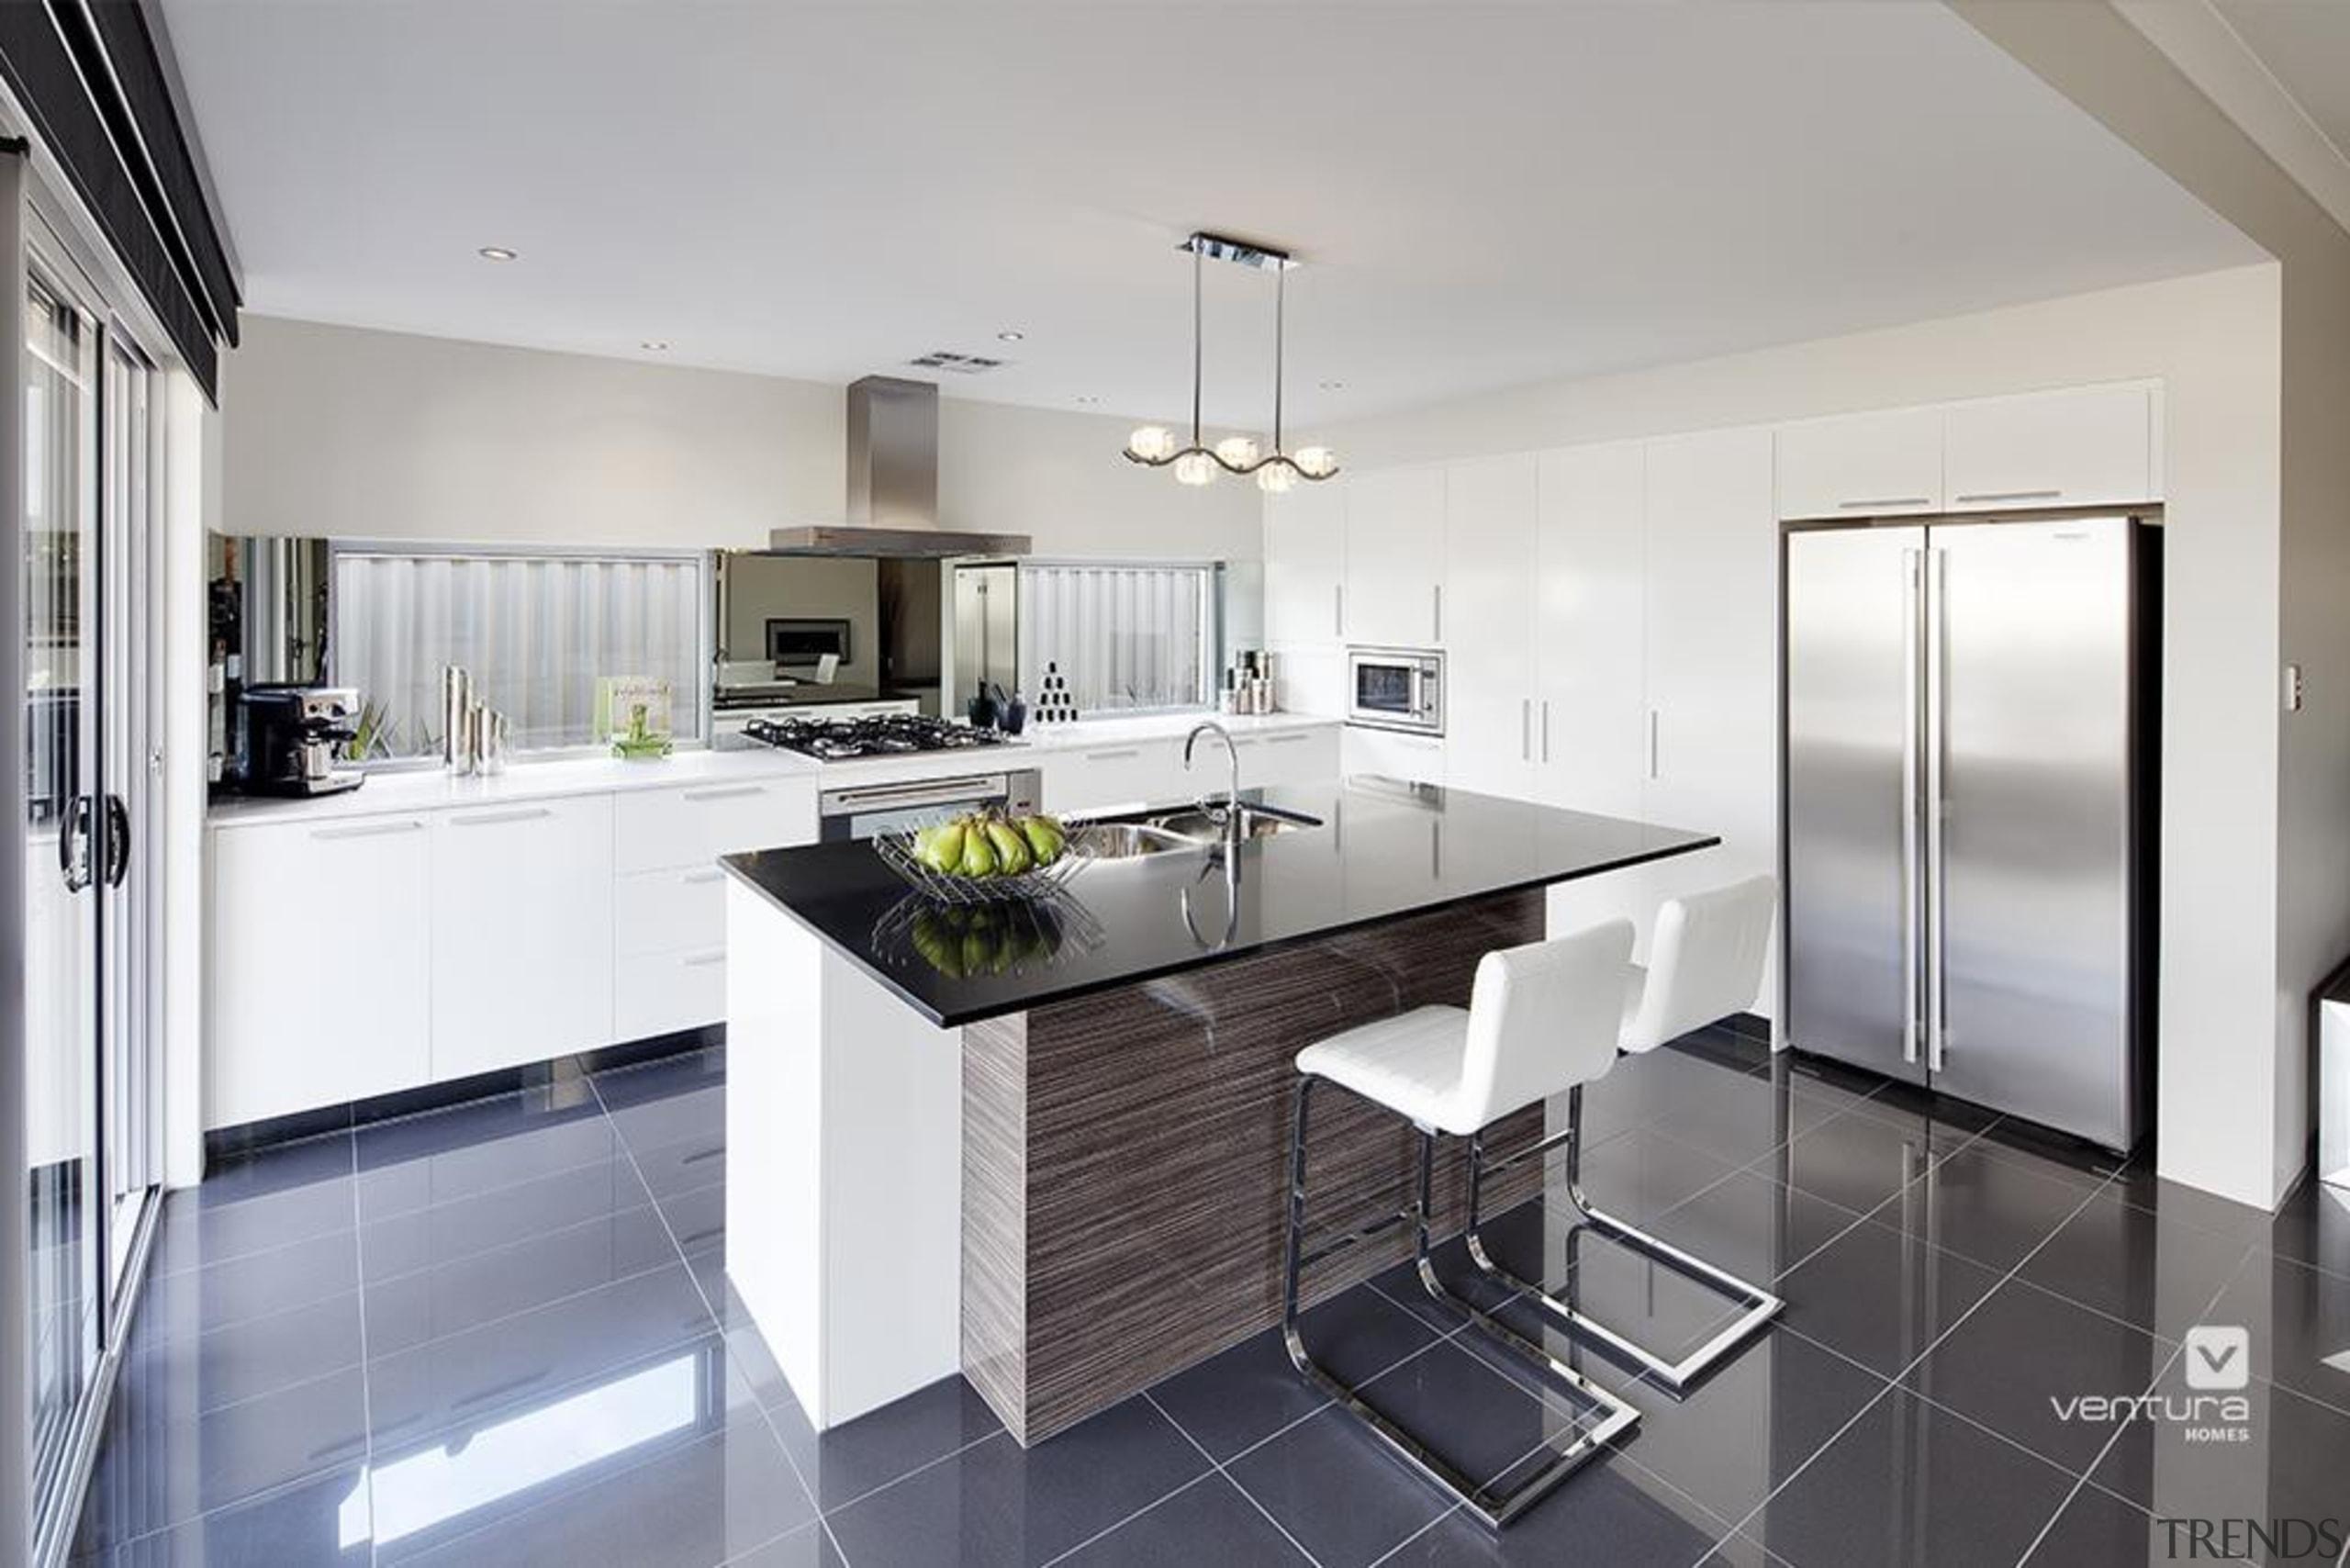 Kitchen design. - The Paramount Display Home - architecture, countertop, cuisine classique, interior design, kitchen, real estate, room, gray